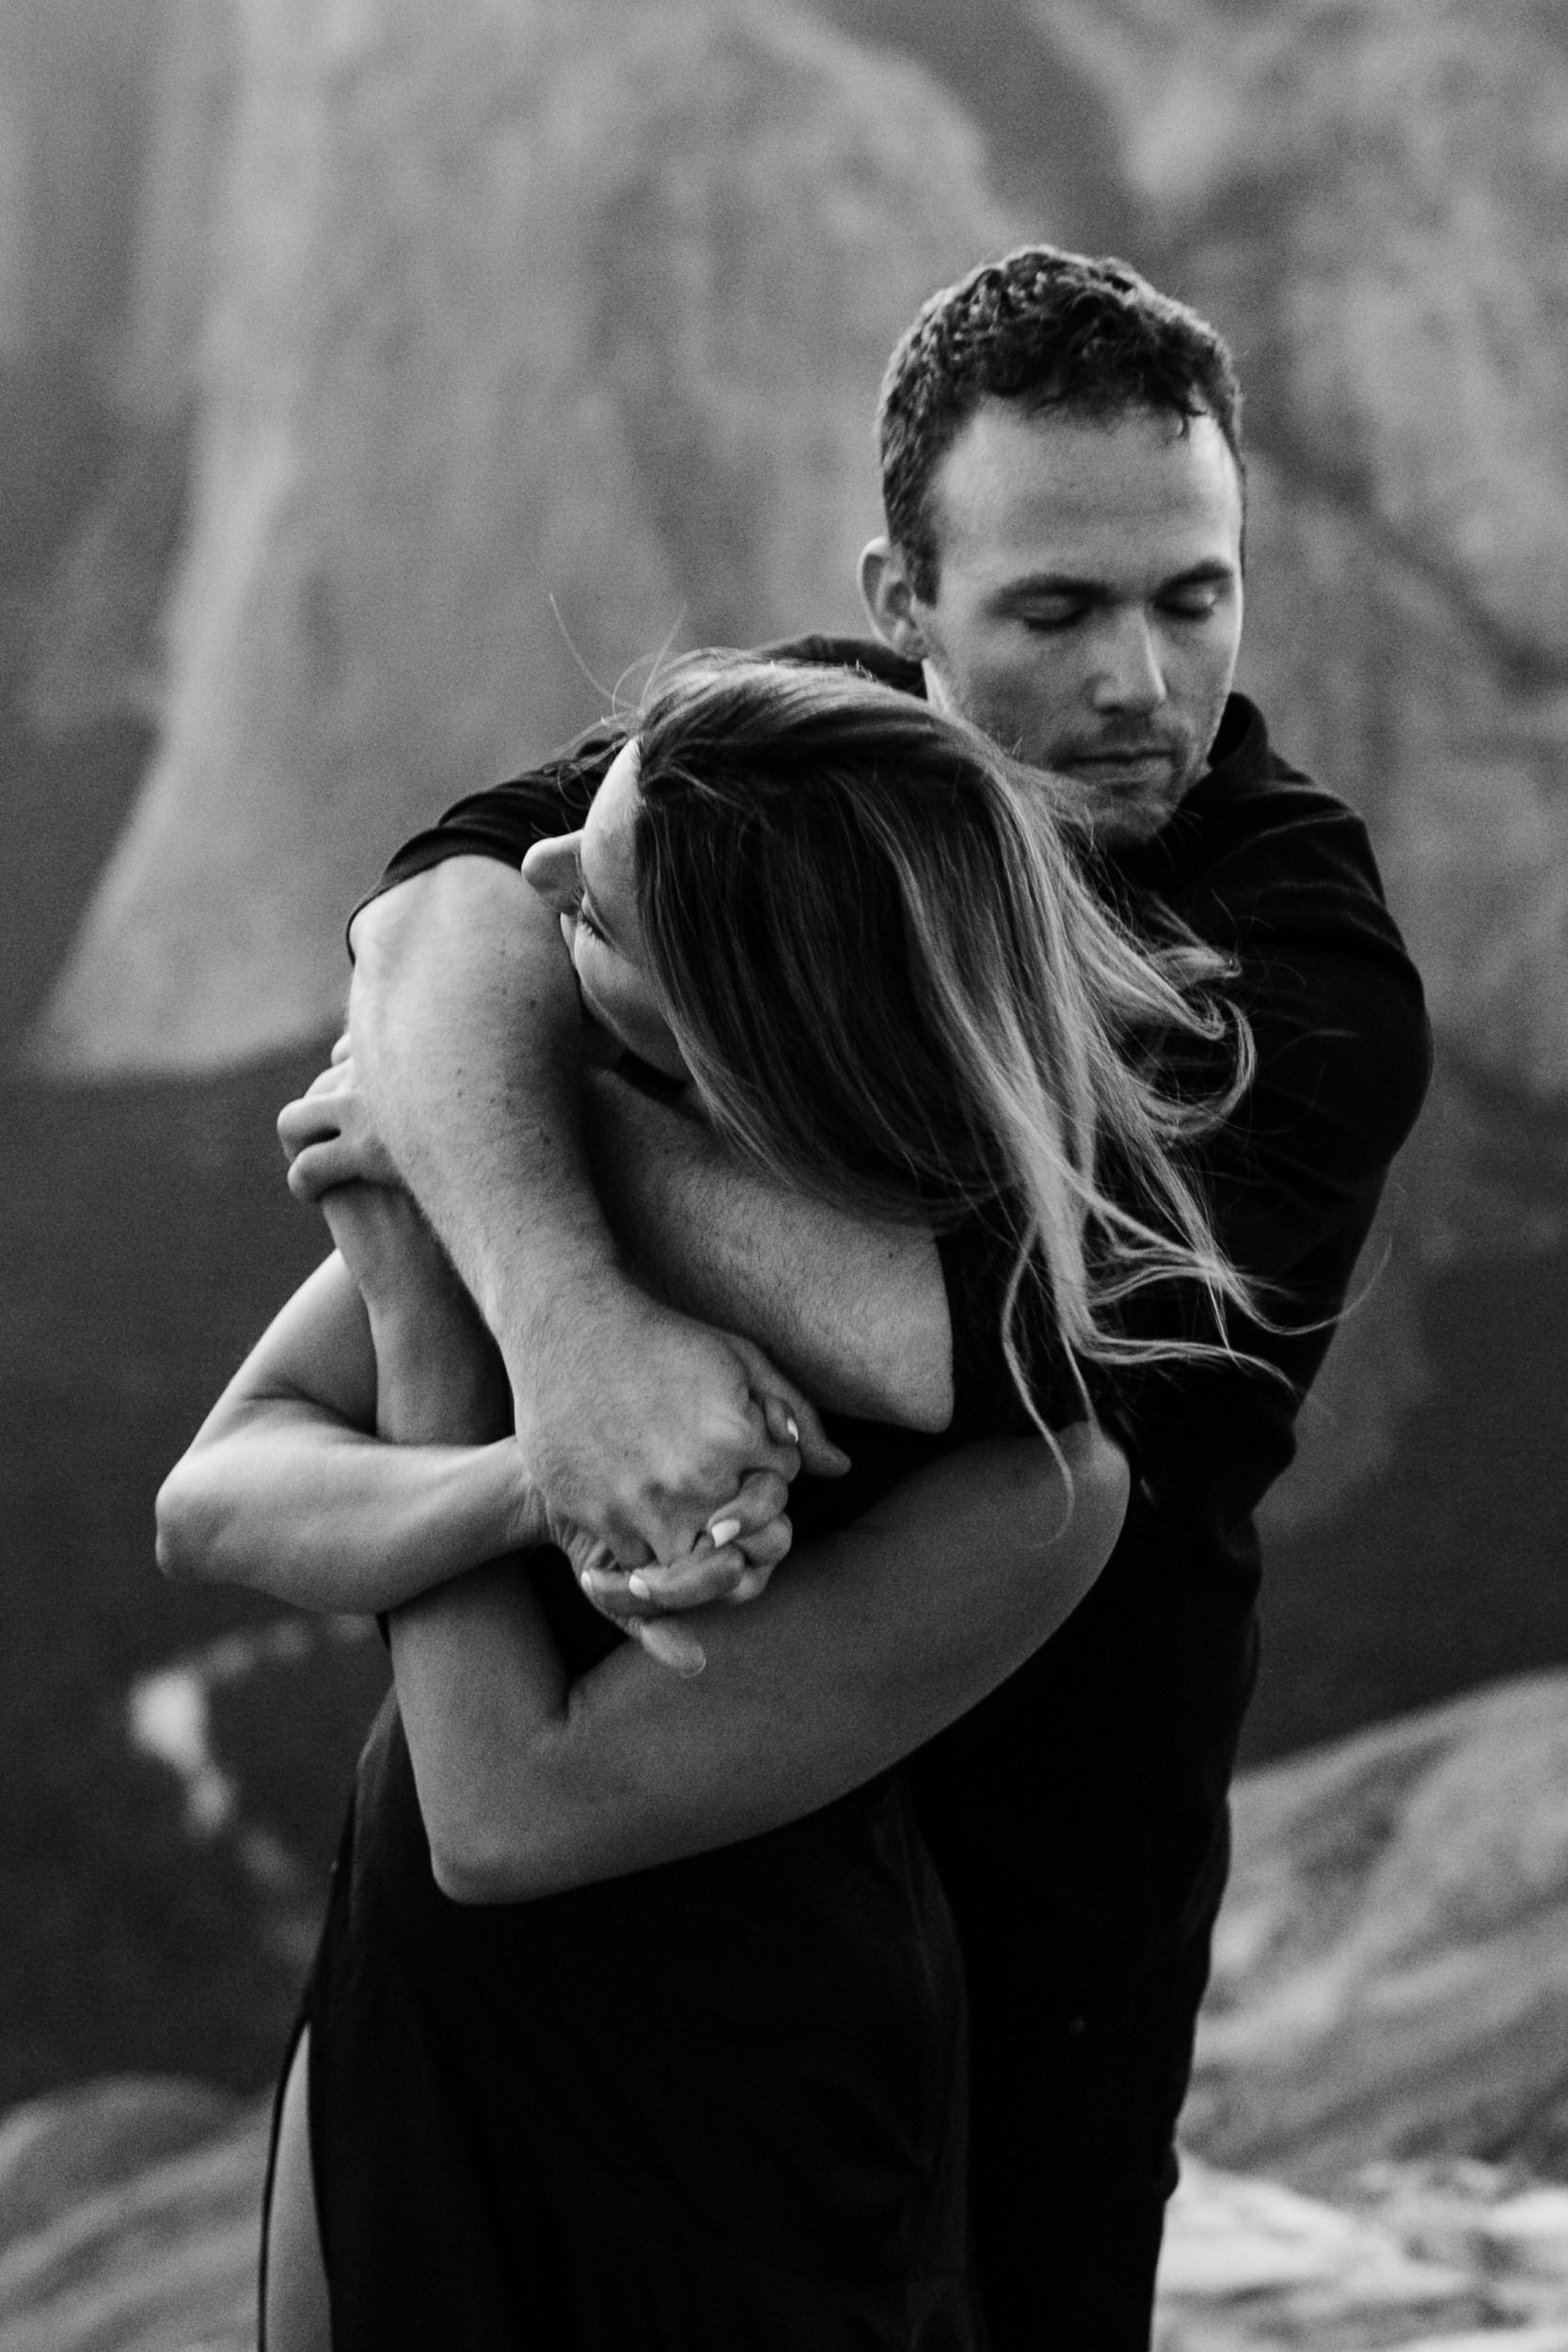 alexandra + david's destination engagement session in the mountains | yosemite elopement inspiration | taft point engagement photos | yosemite national park wedding photographer